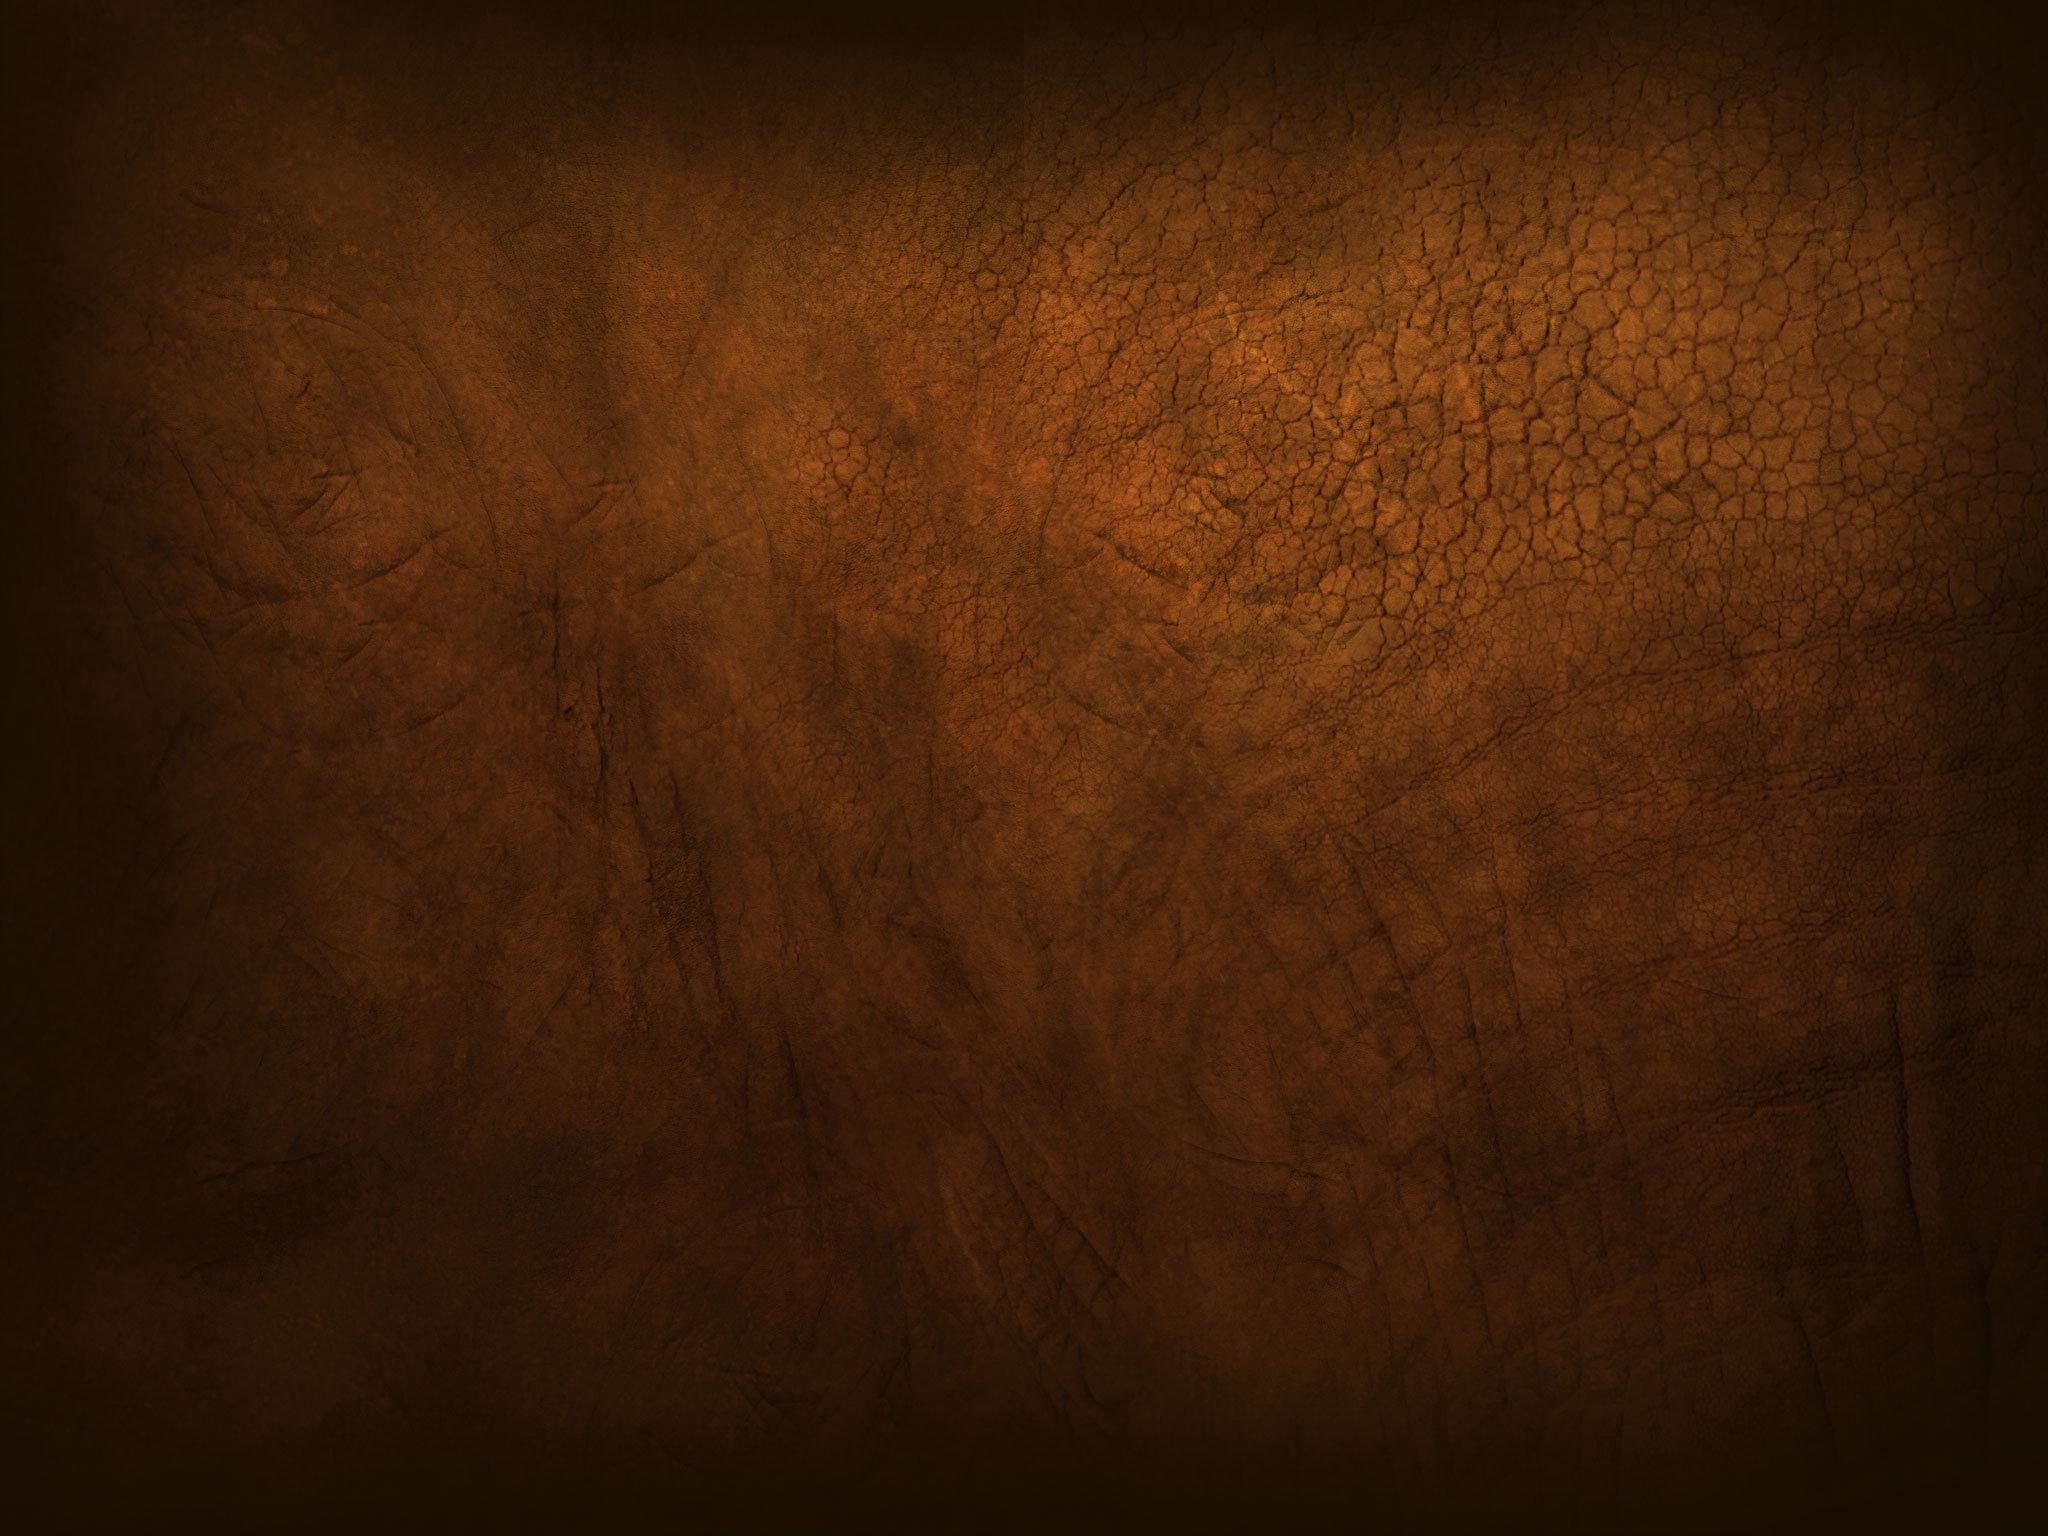 Texture HD Wallpaper